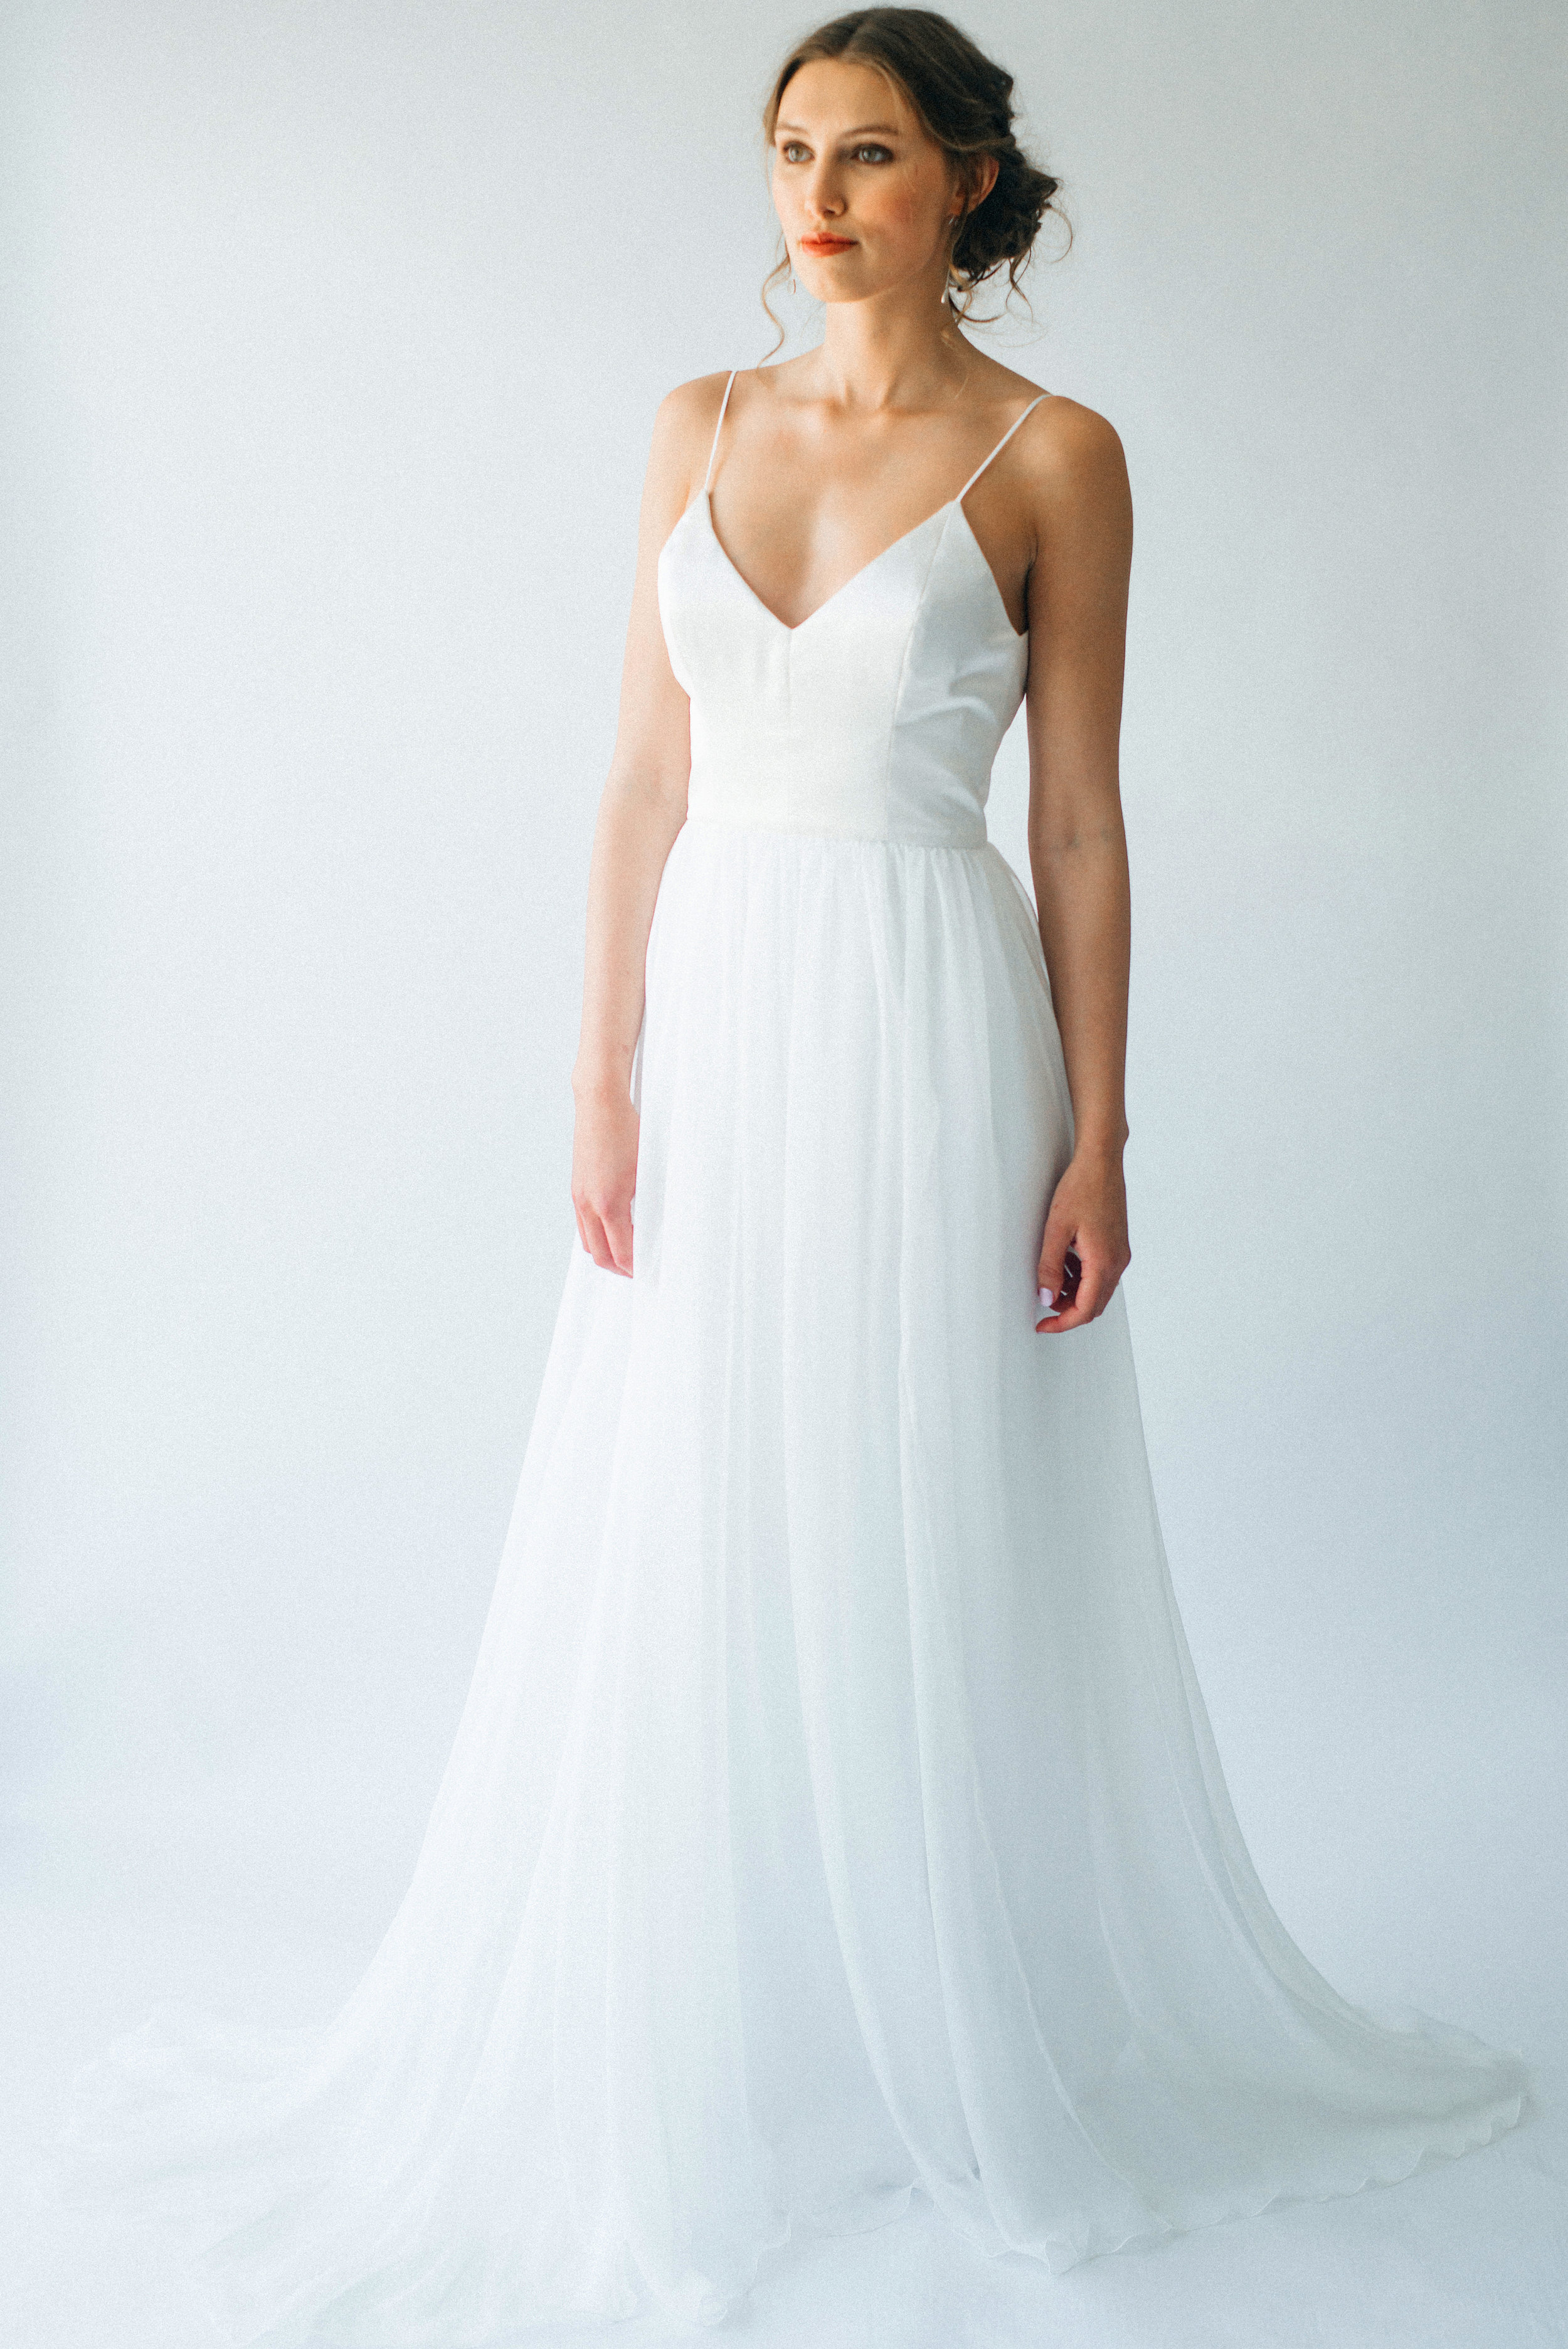 Handmade-wedding-dress-Cornwall.jpg